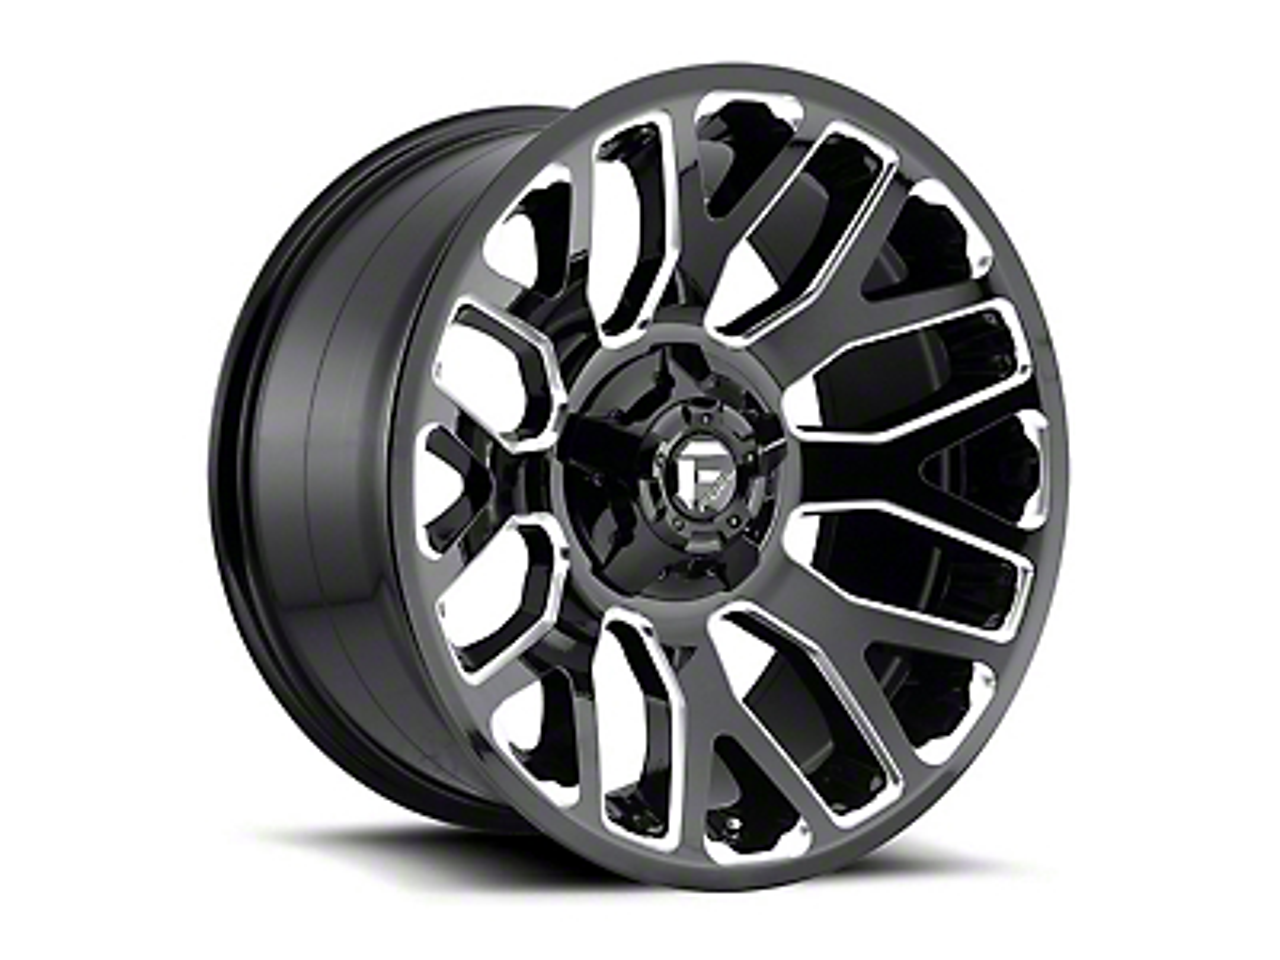 Fuel Wheels Titan II Gloss Black Milled 5-Lug Wheel - 20x10 (02-18 RAM 1500, Excluding Mega Cab)